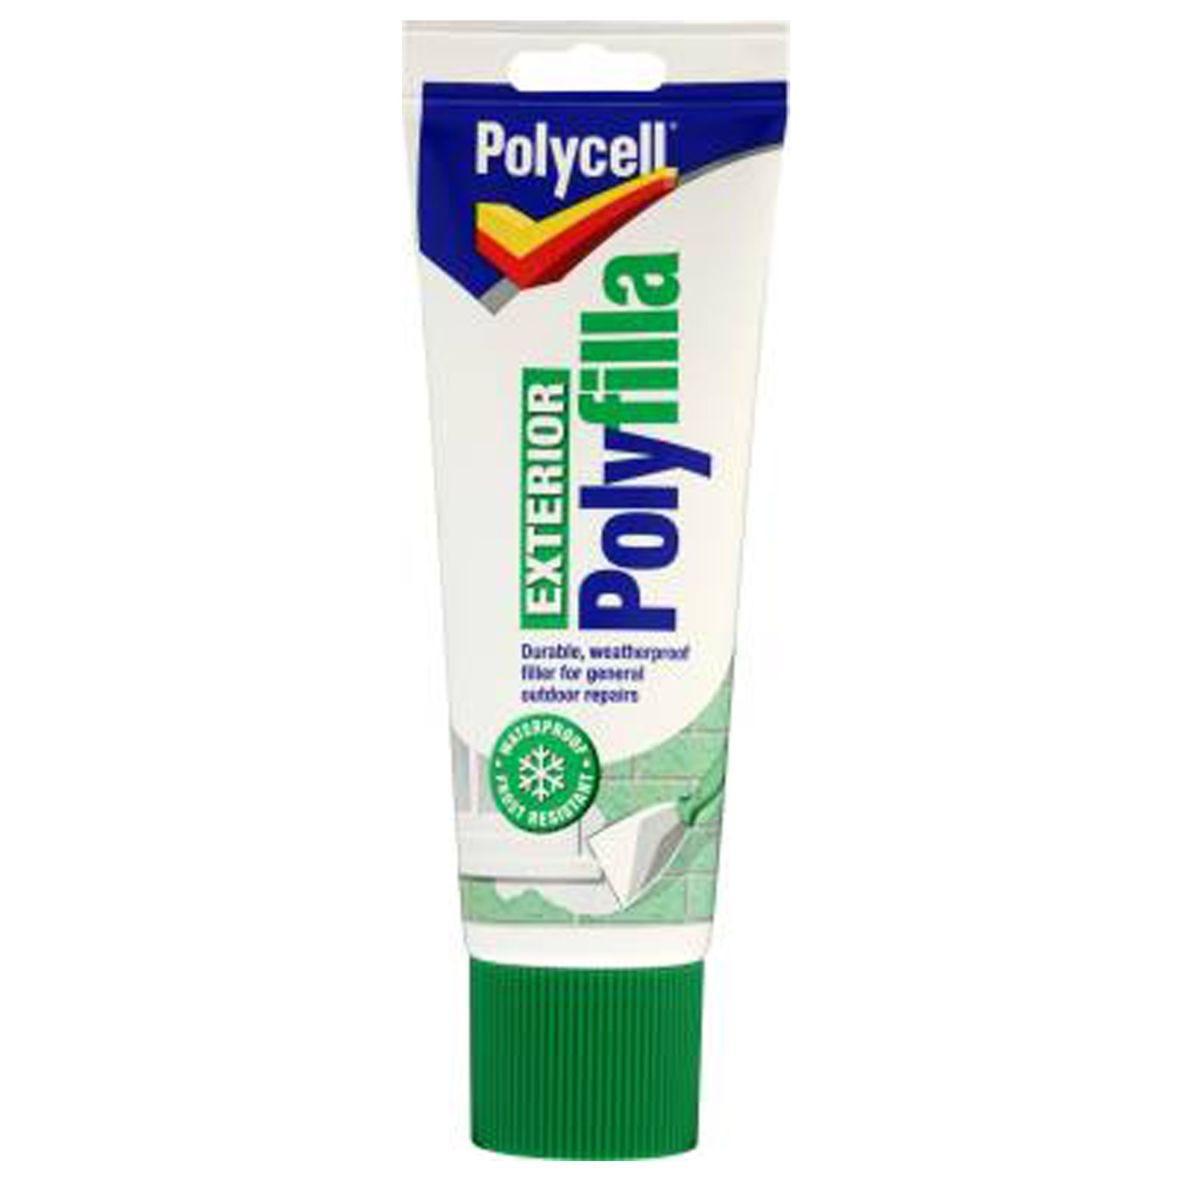 Polycell Multi Purpose Exterior Polyfilla Tube- 330g